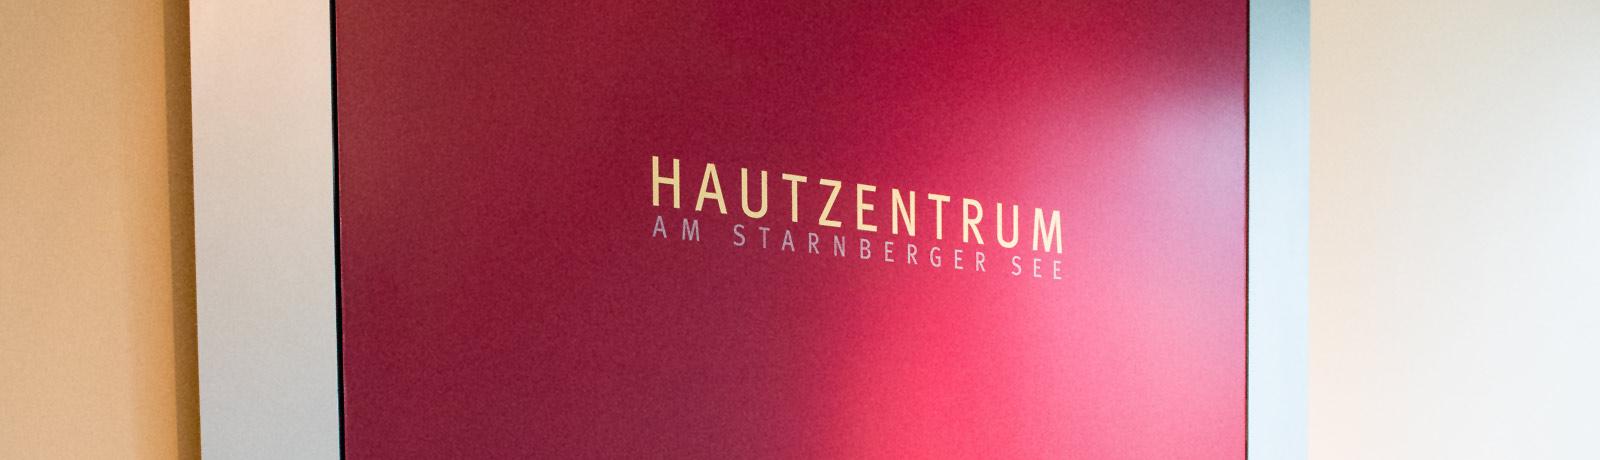 kosmetik starnberg hautzentrum am starnberger see kosmetik spa. Black Bedroom Furniture Sets. Home Design Ideas